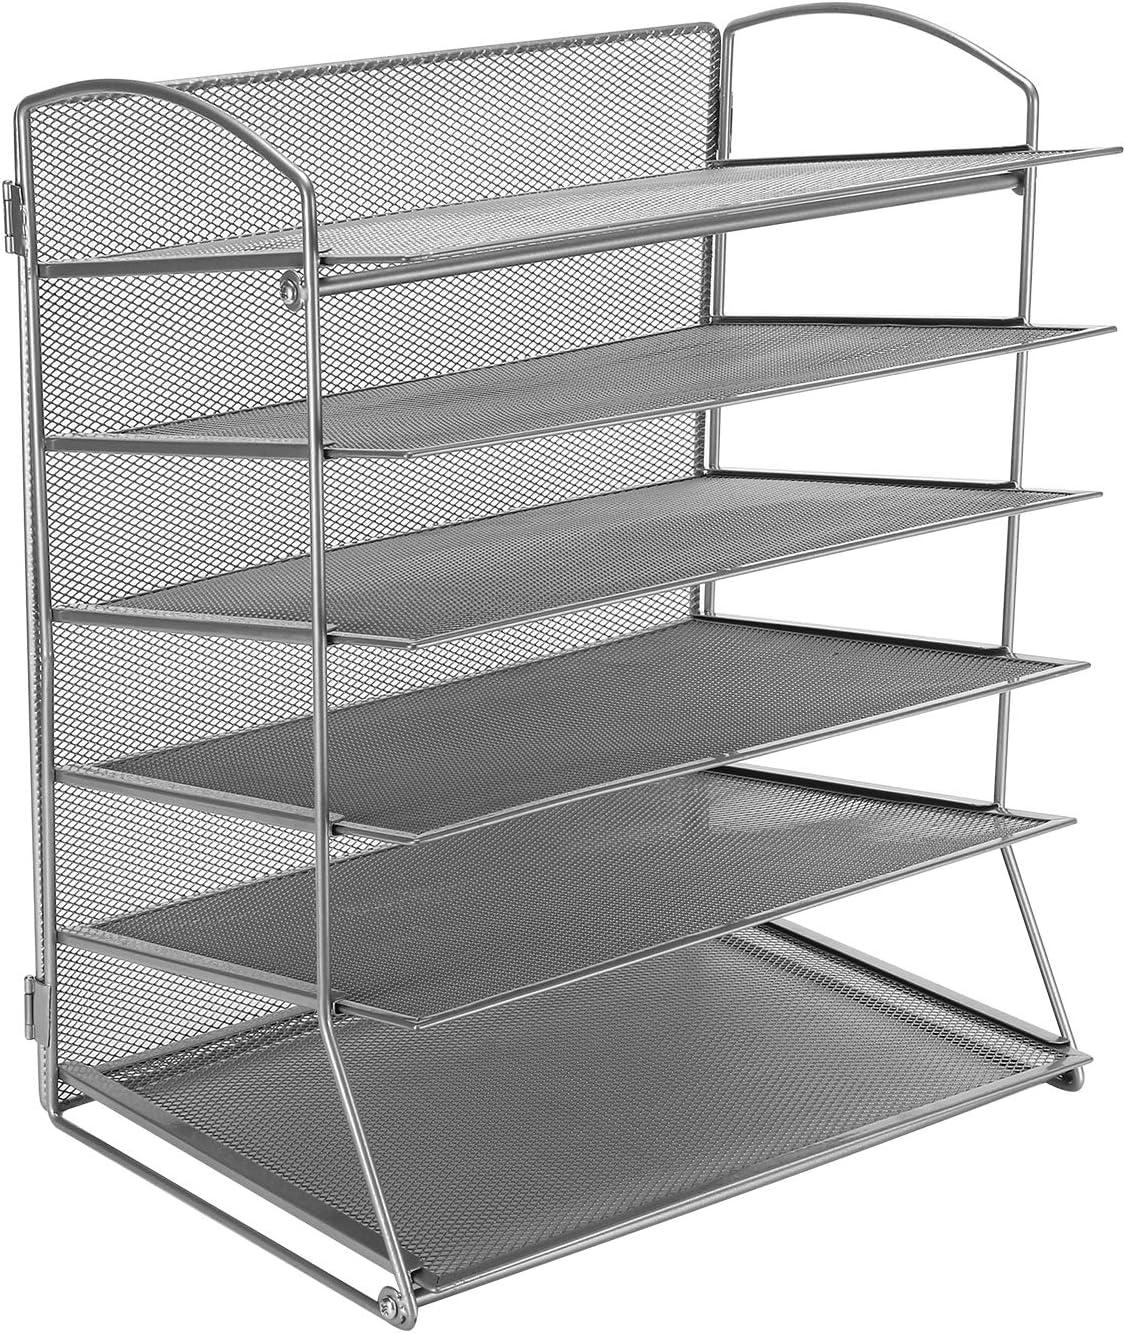 CLATINA 6-Tier Metal Mesh Desk File Organizer Desktop Letter Tray Paper Document Holder for Office Home School Gray